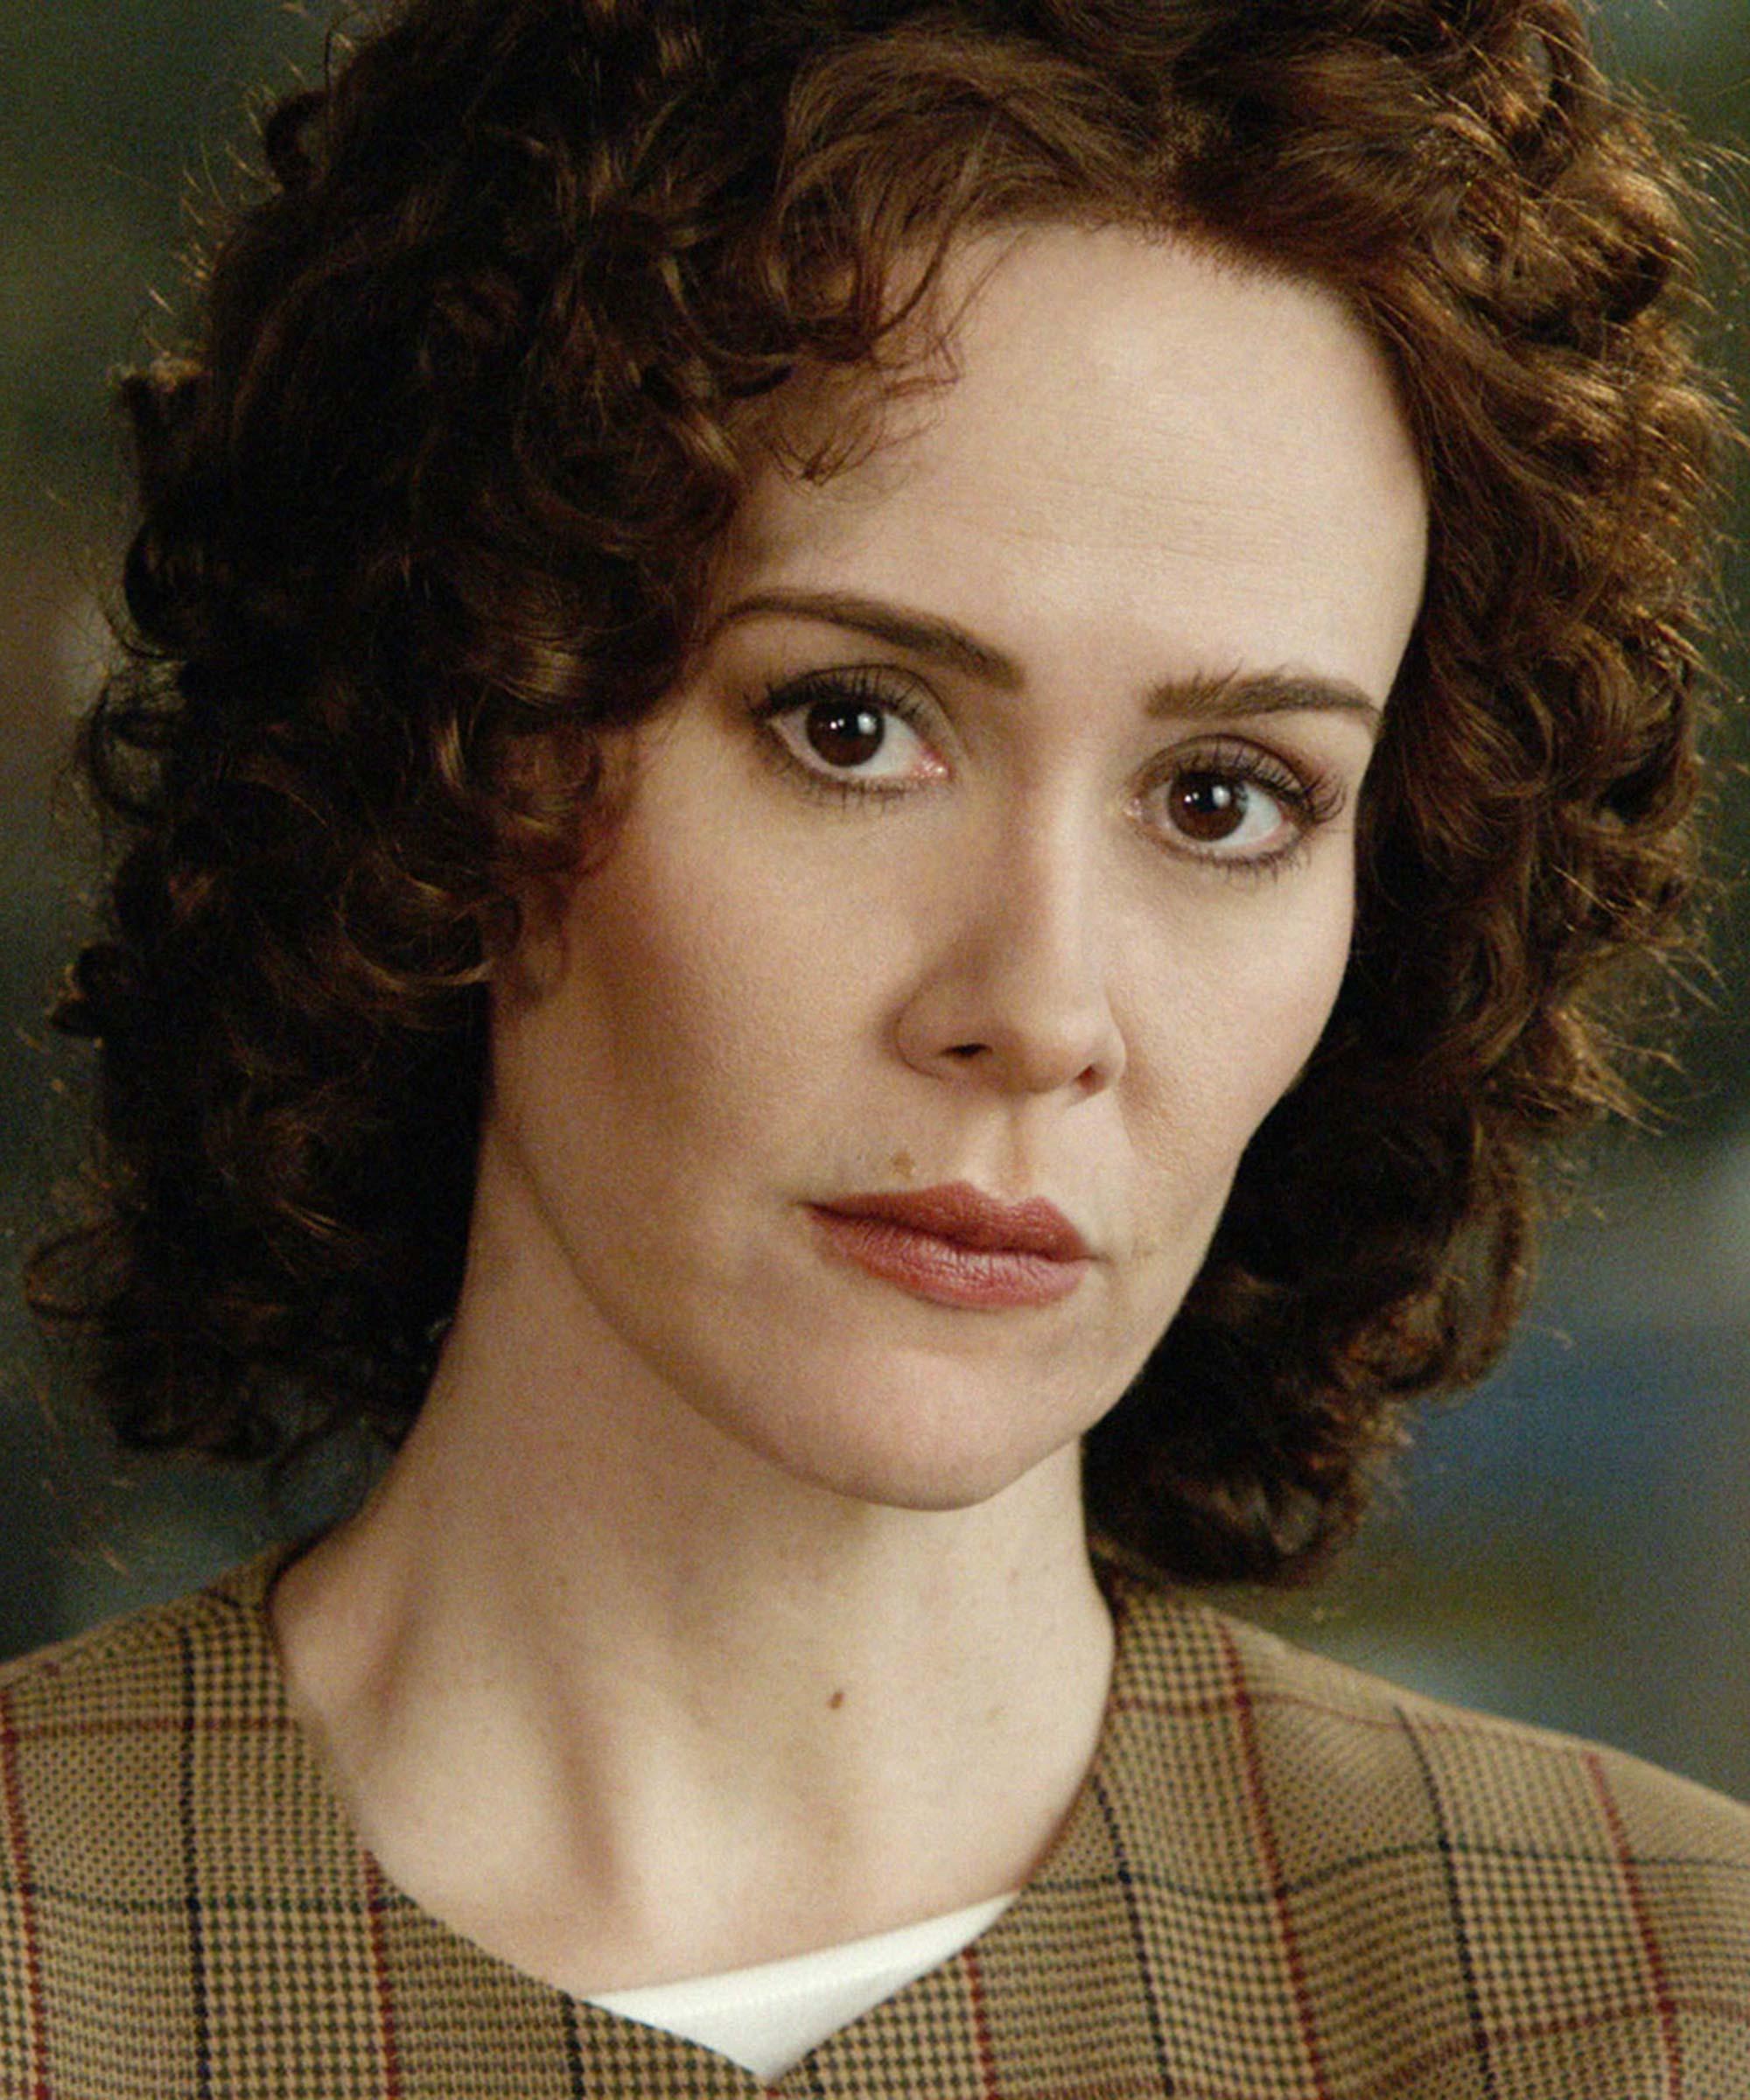 Marcia Clark Hair Perm Oj Simpson Trial